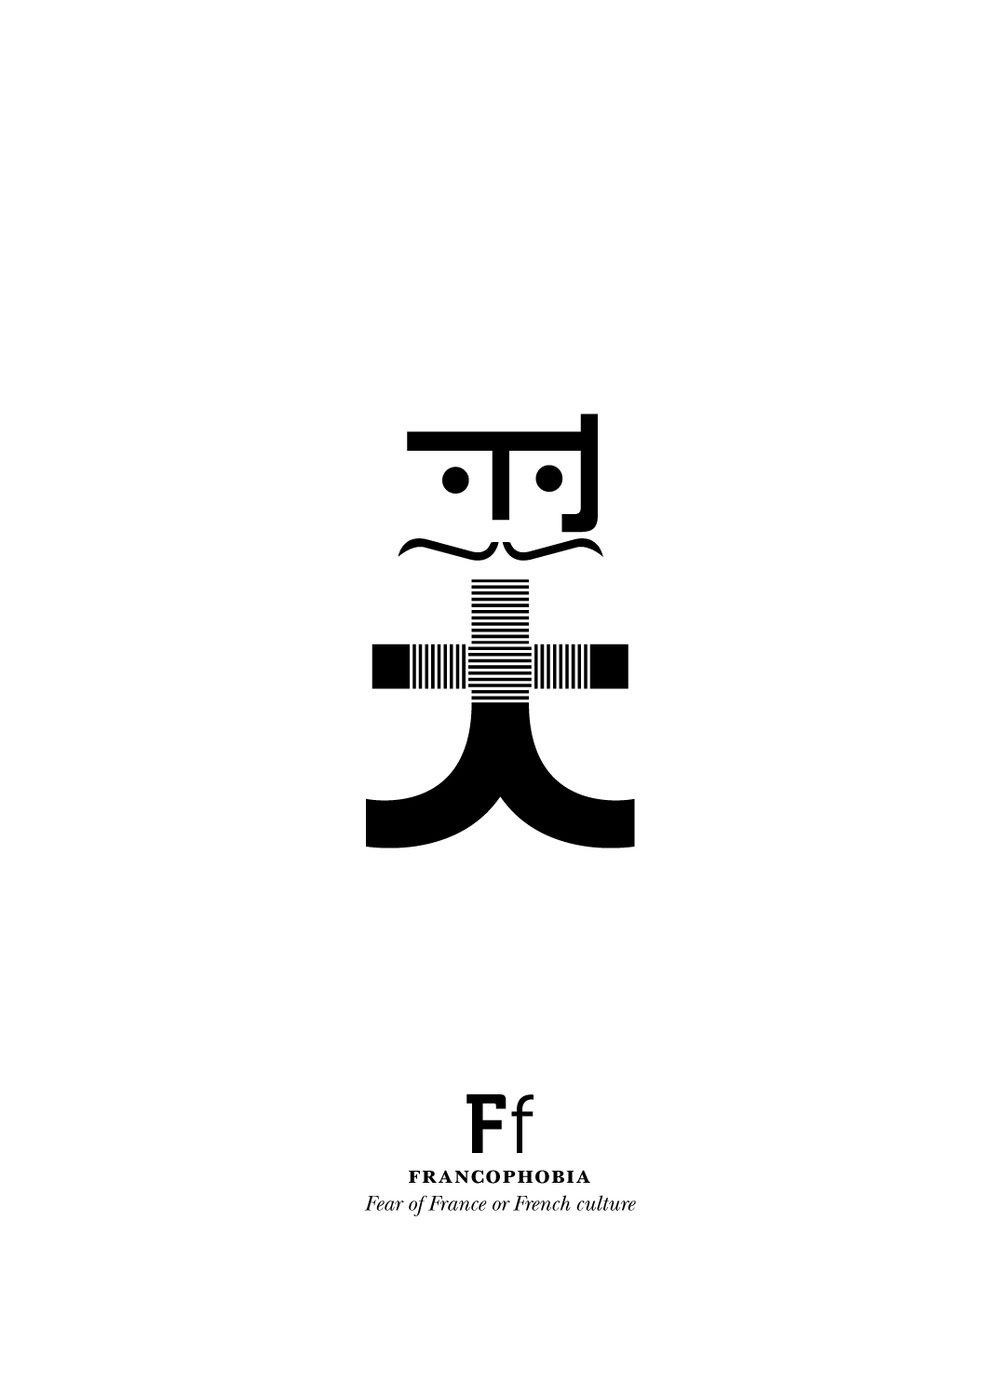 book_of_fears_F.jpg